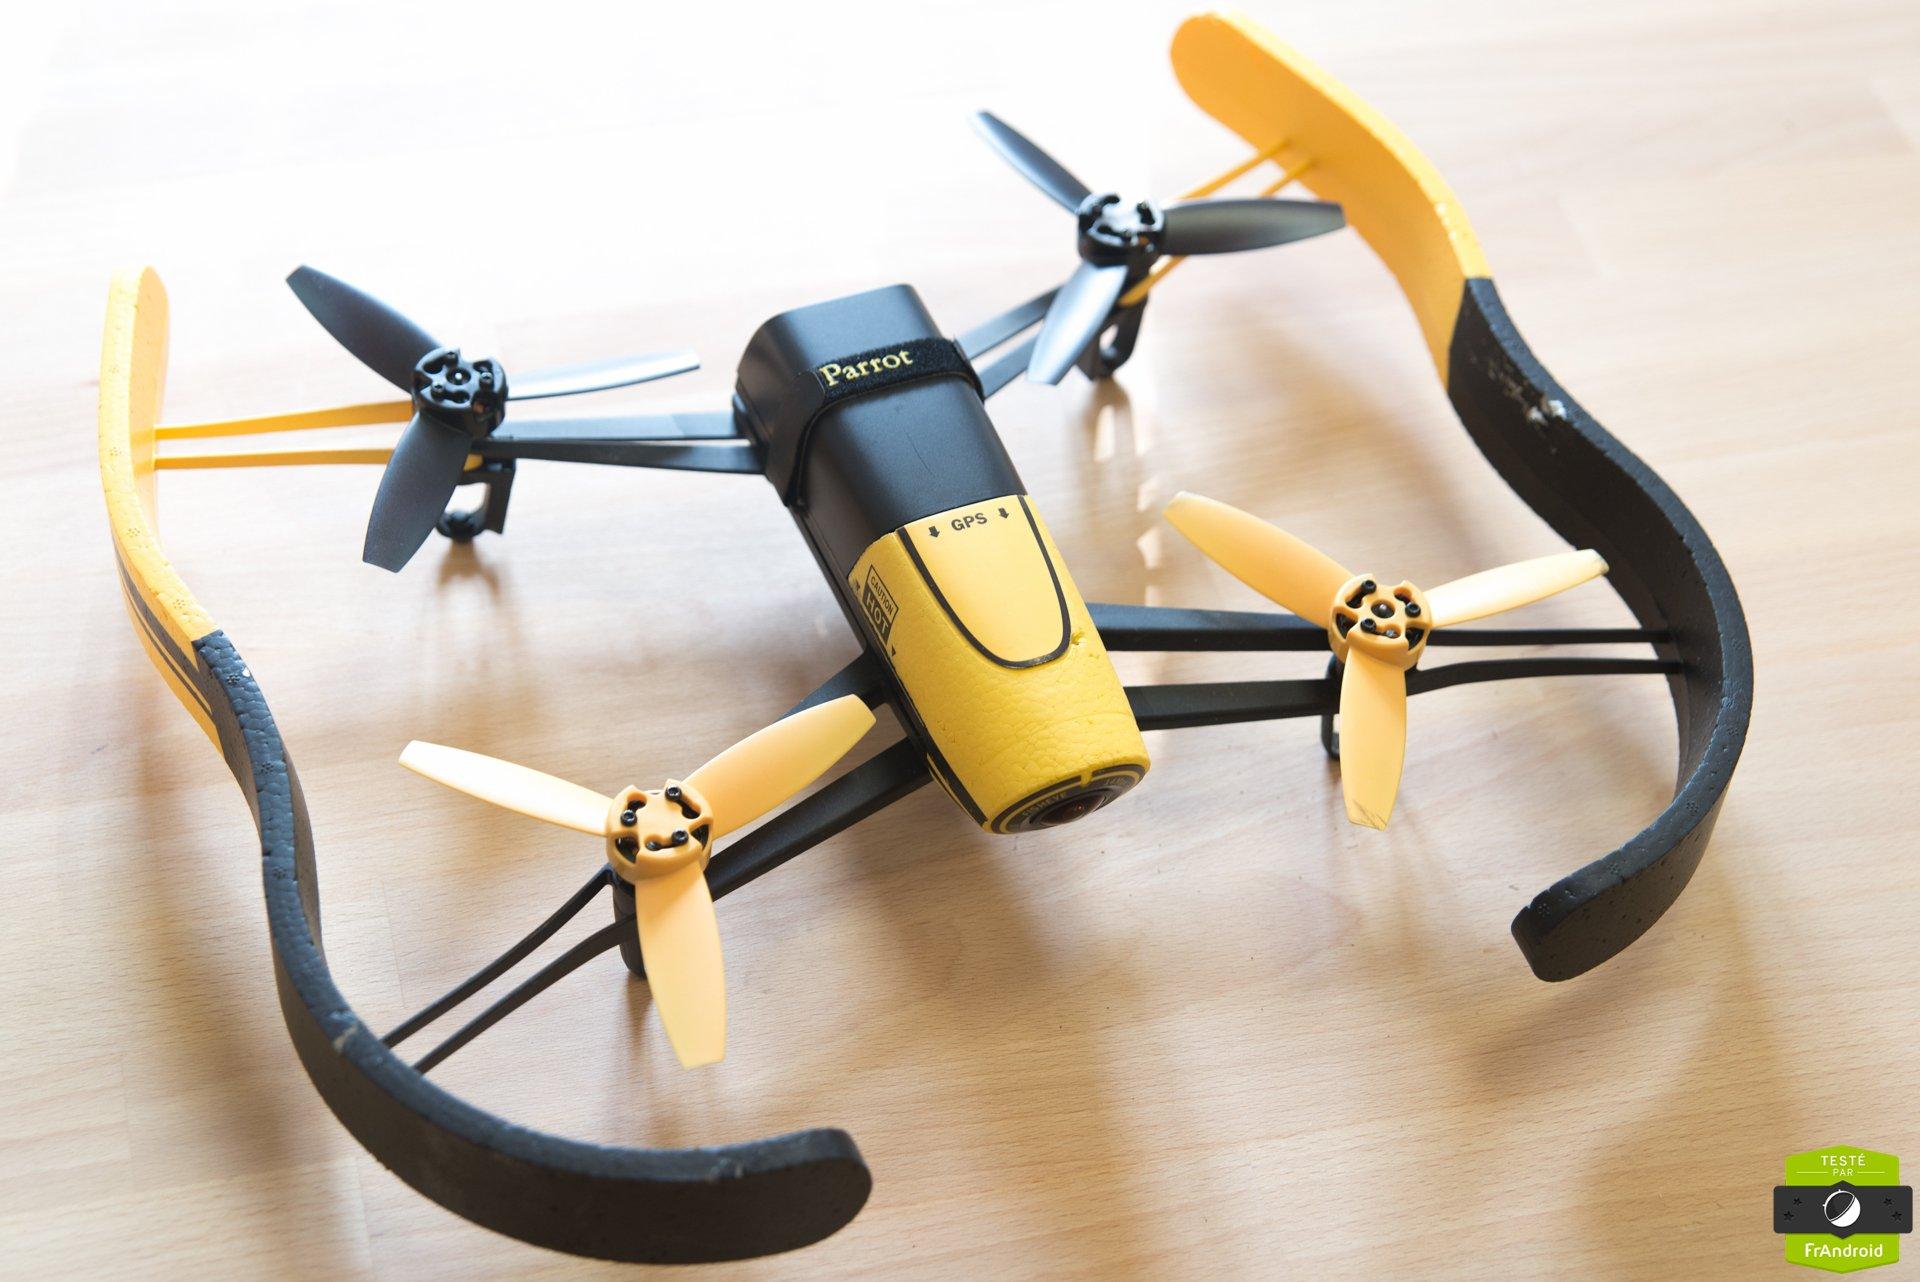 test du parrot bebop drone les vid os de vacances. Black Bedroom Furniture Sets. Home Design Ideas